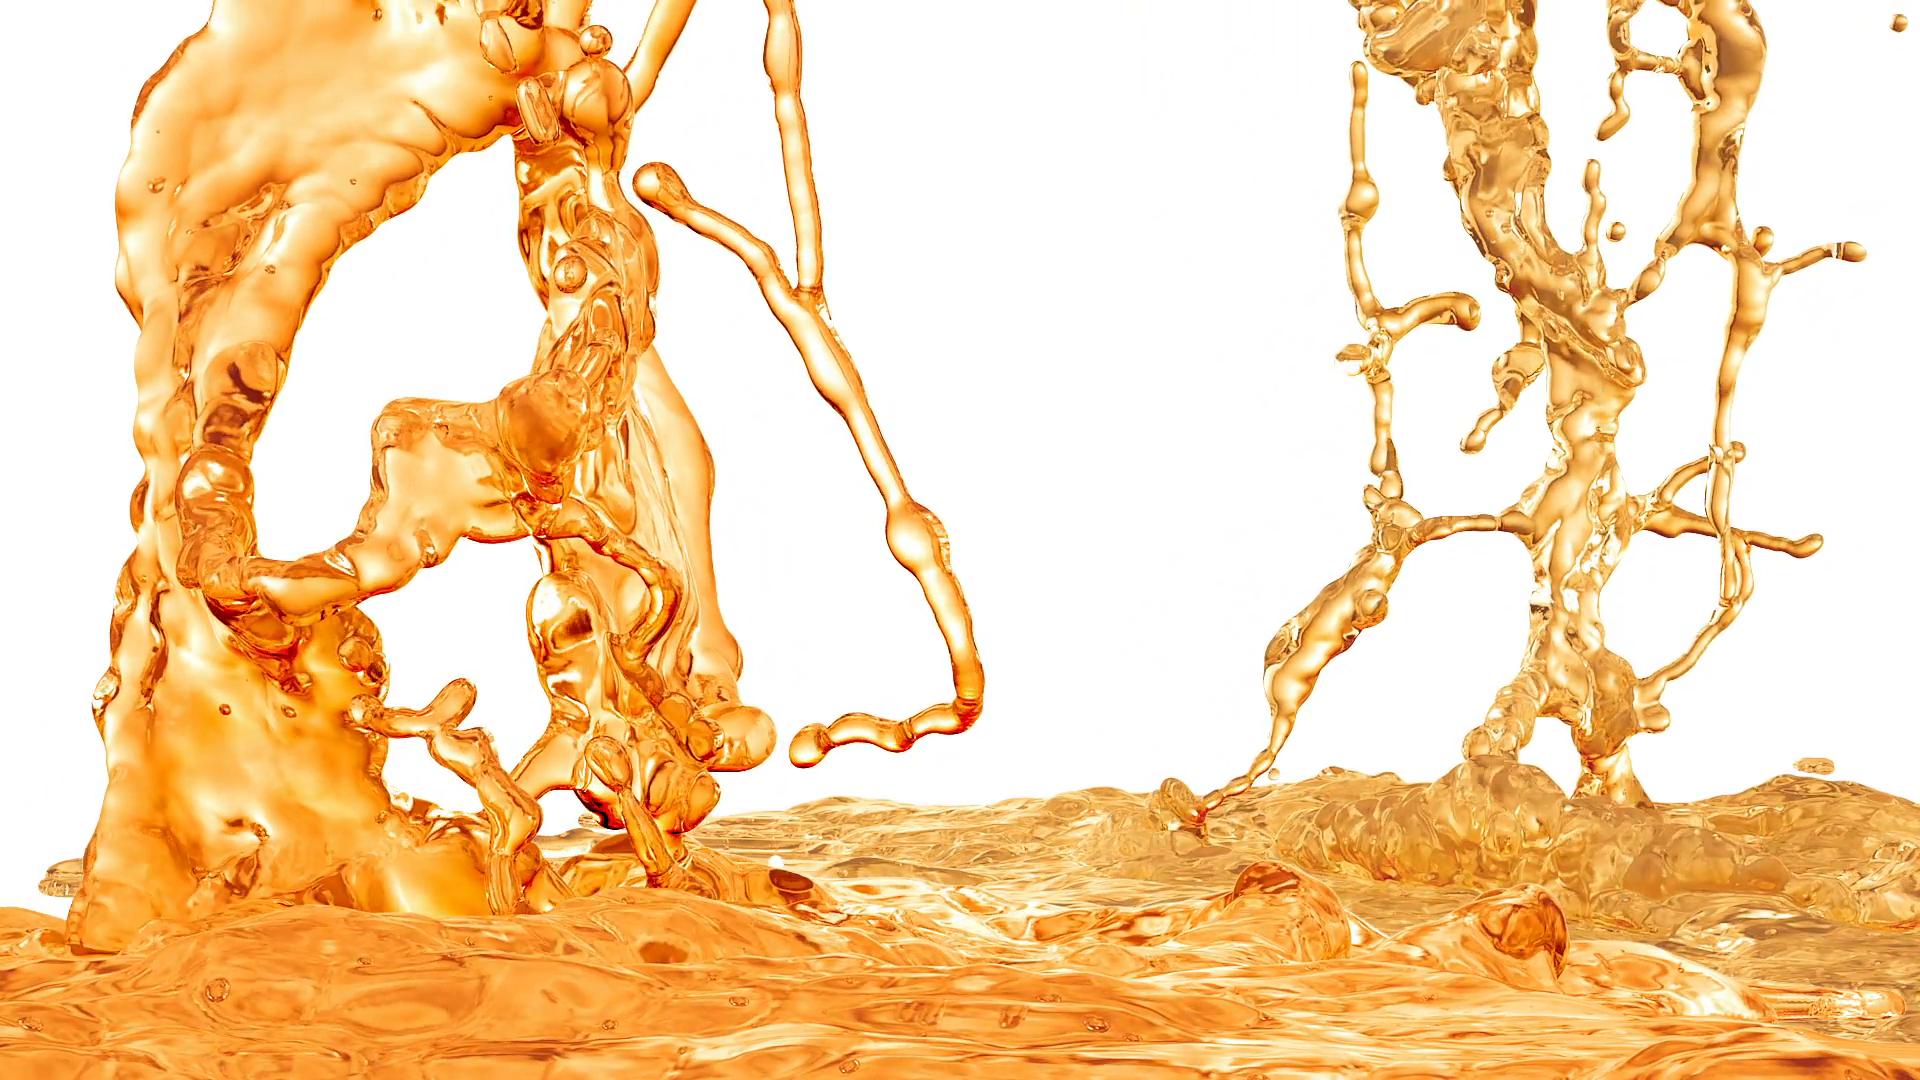 Tea Splash. Super Slow motion,with mask. Motion Background.